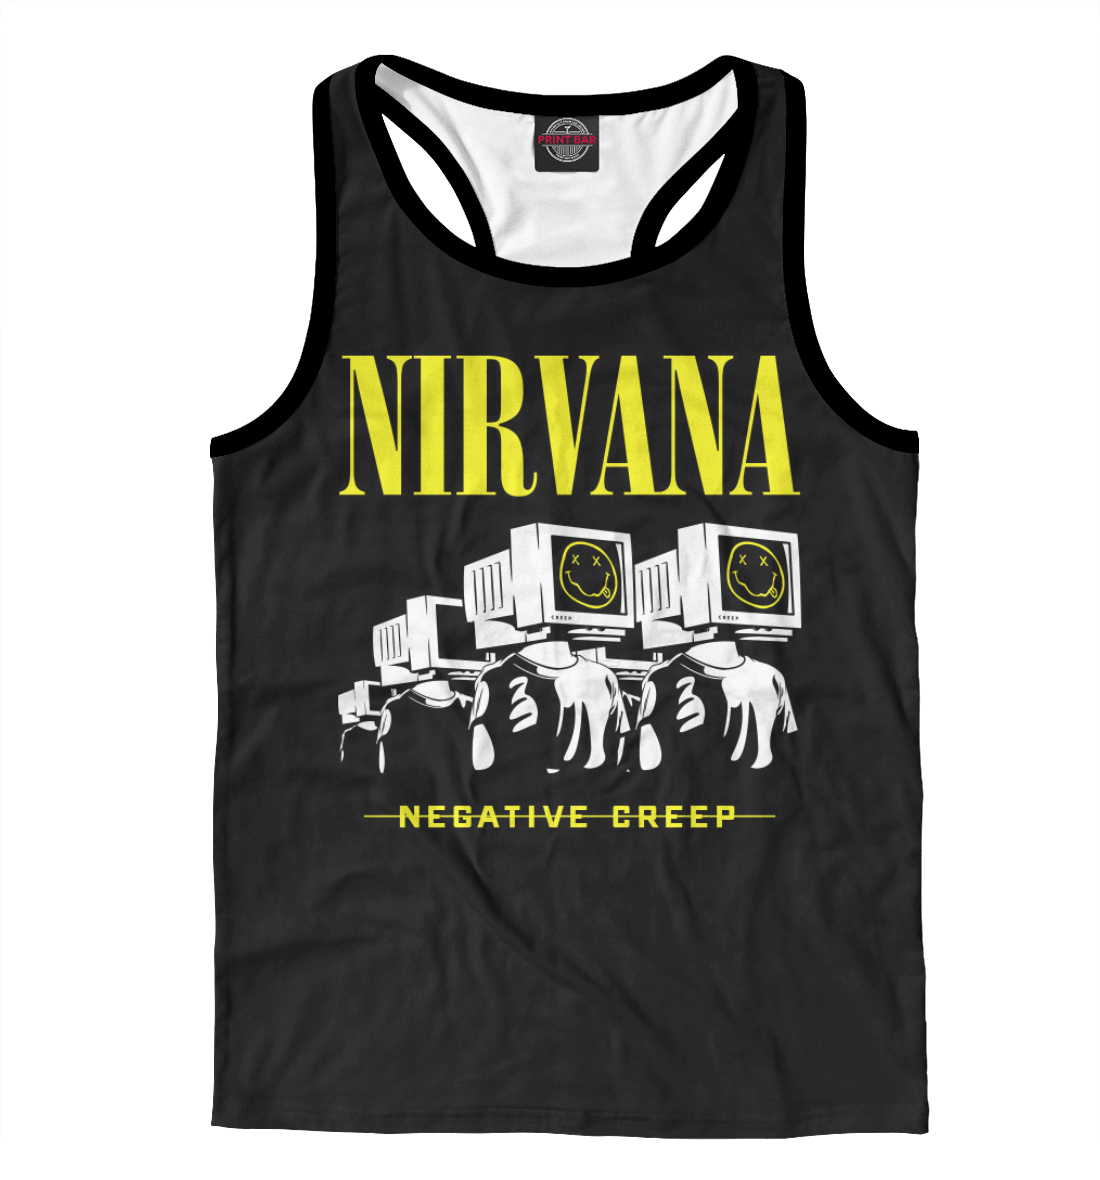 Купить Майка для мальчика Nirvana NIR-451766-mayb-2